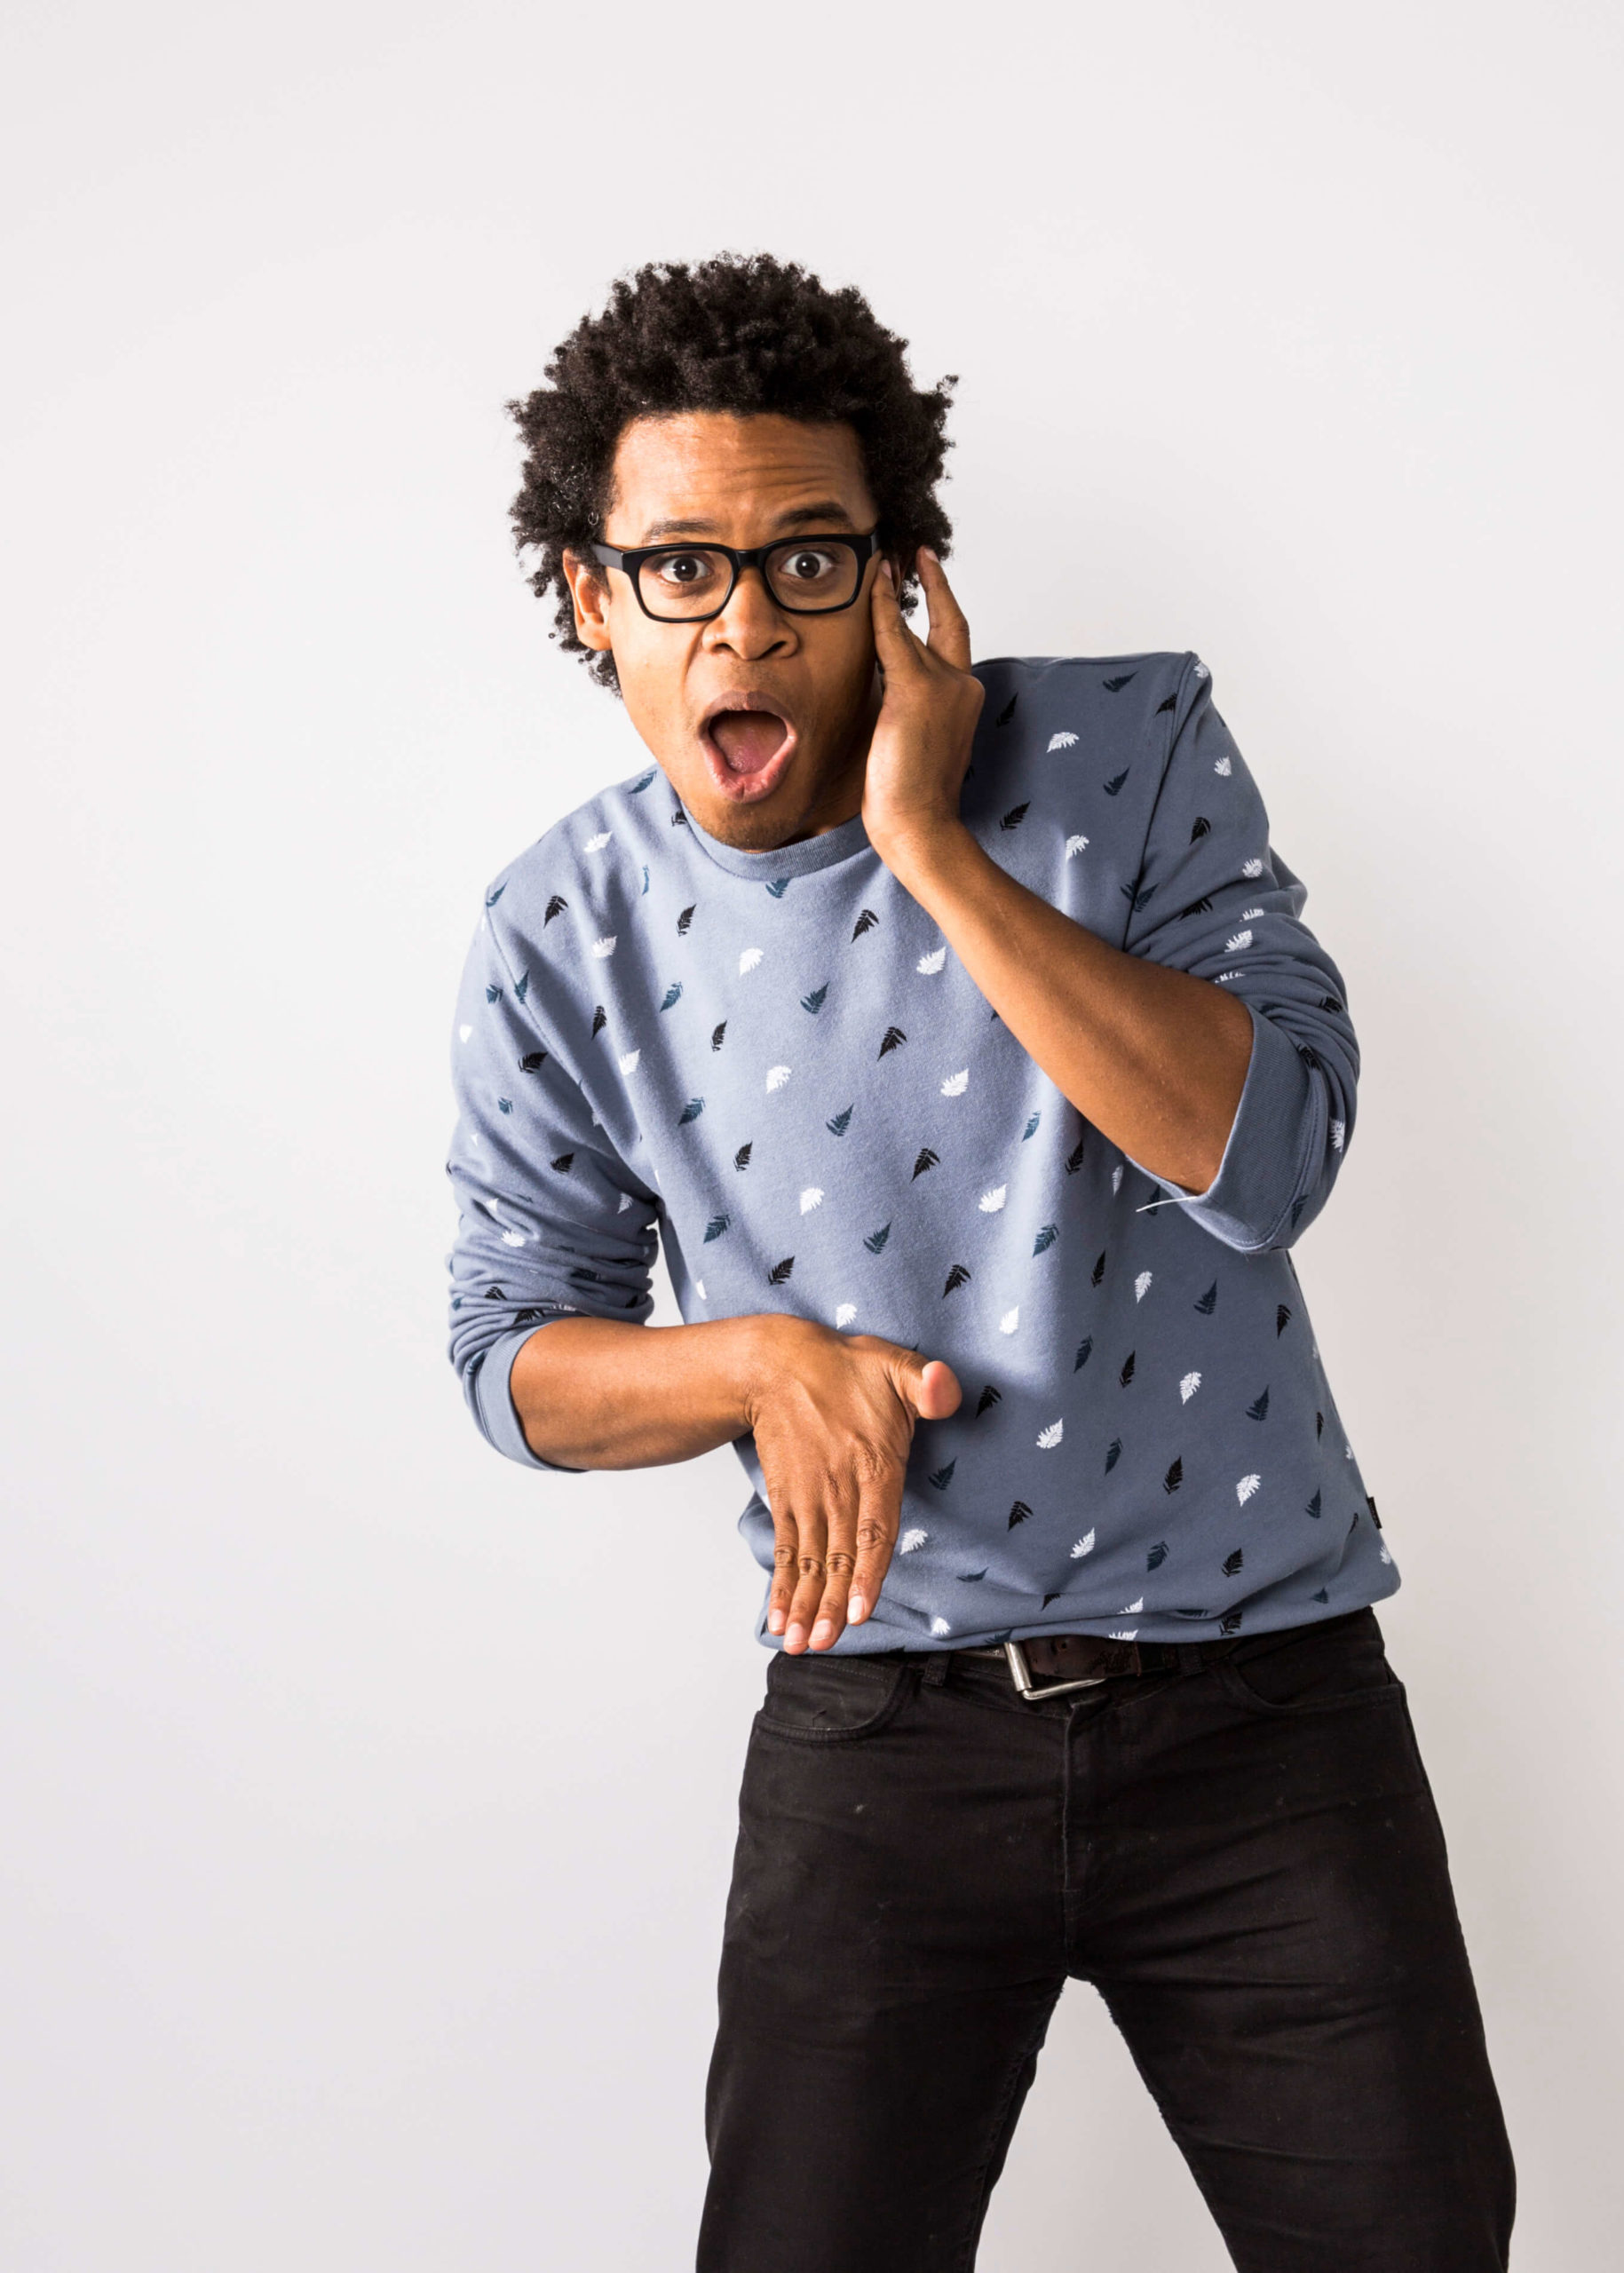 Jordan-Carlos-Hi-Res-Nov-2014-USE